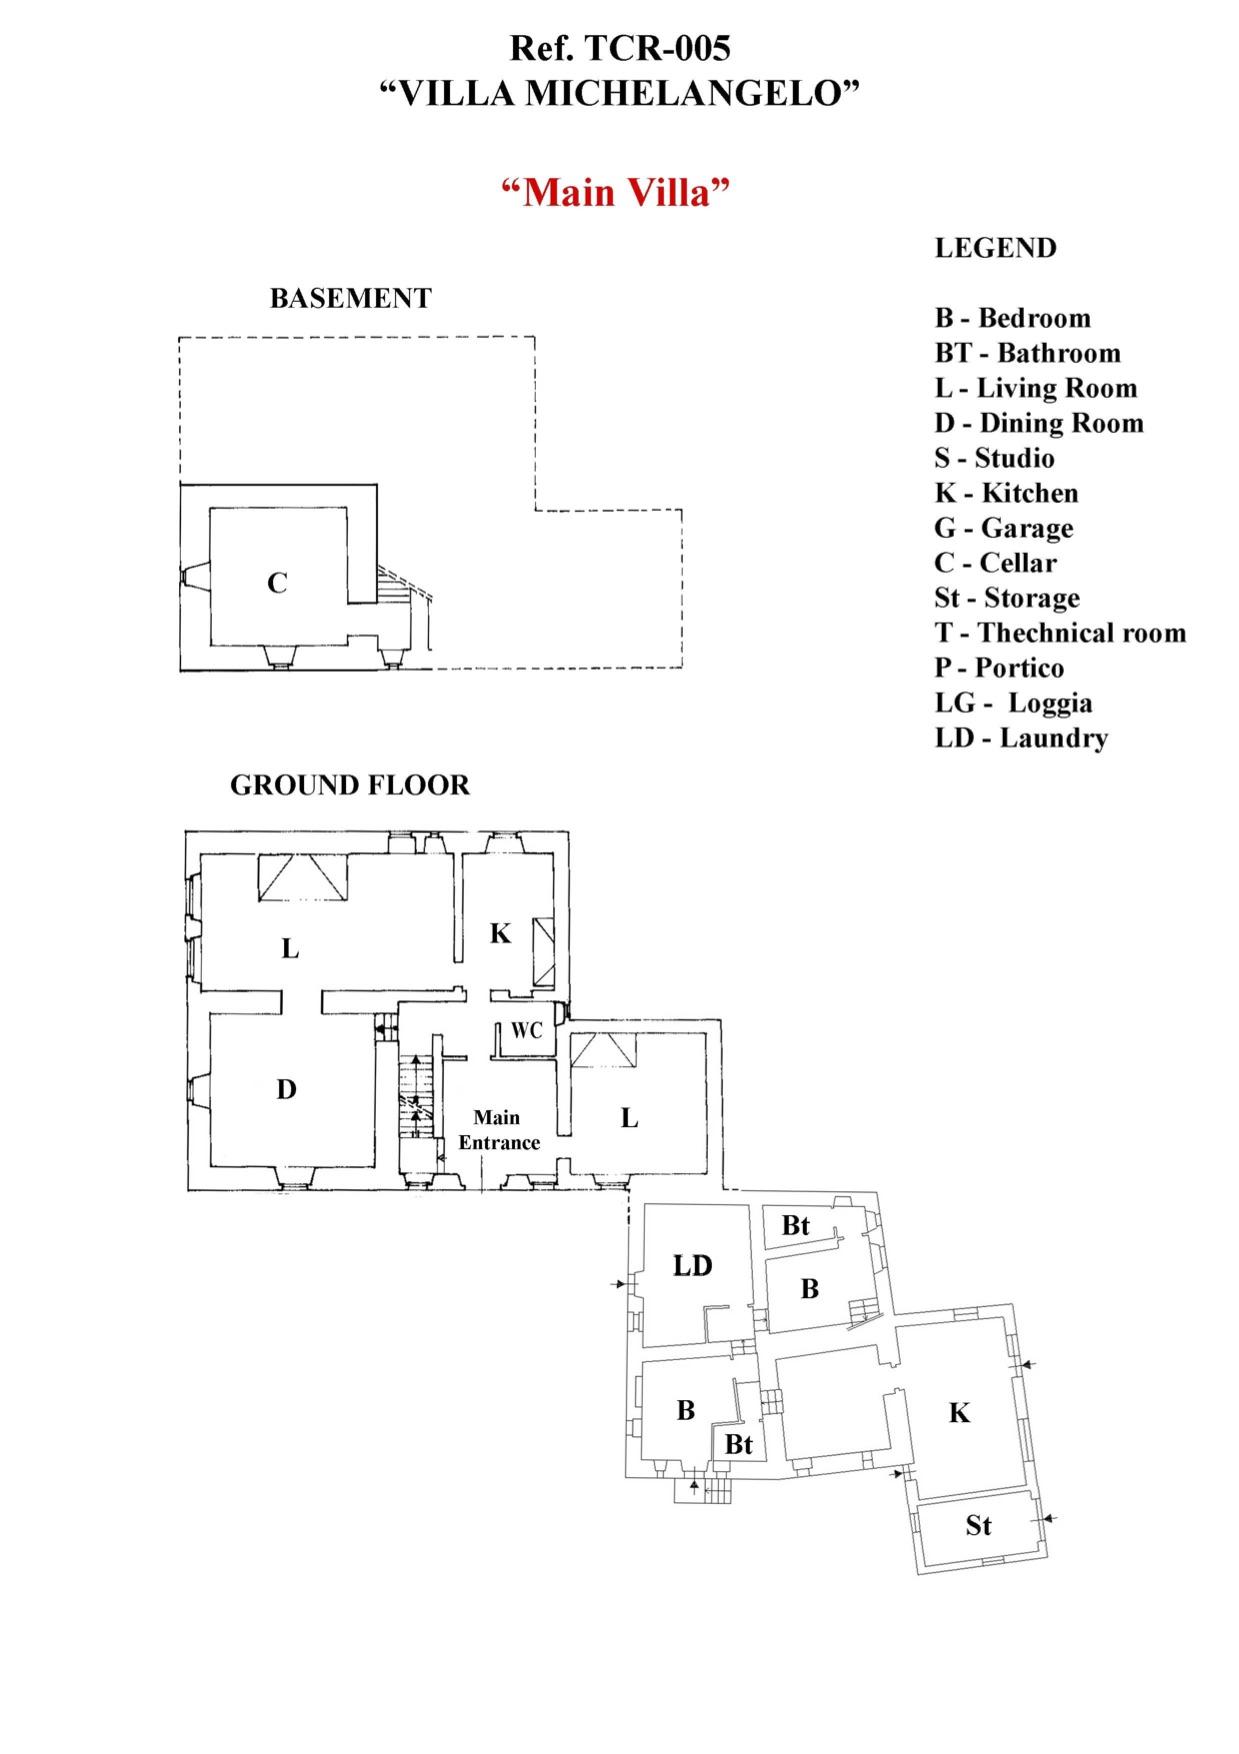 Plans of Michelangelo's Villa (click to enlarge)